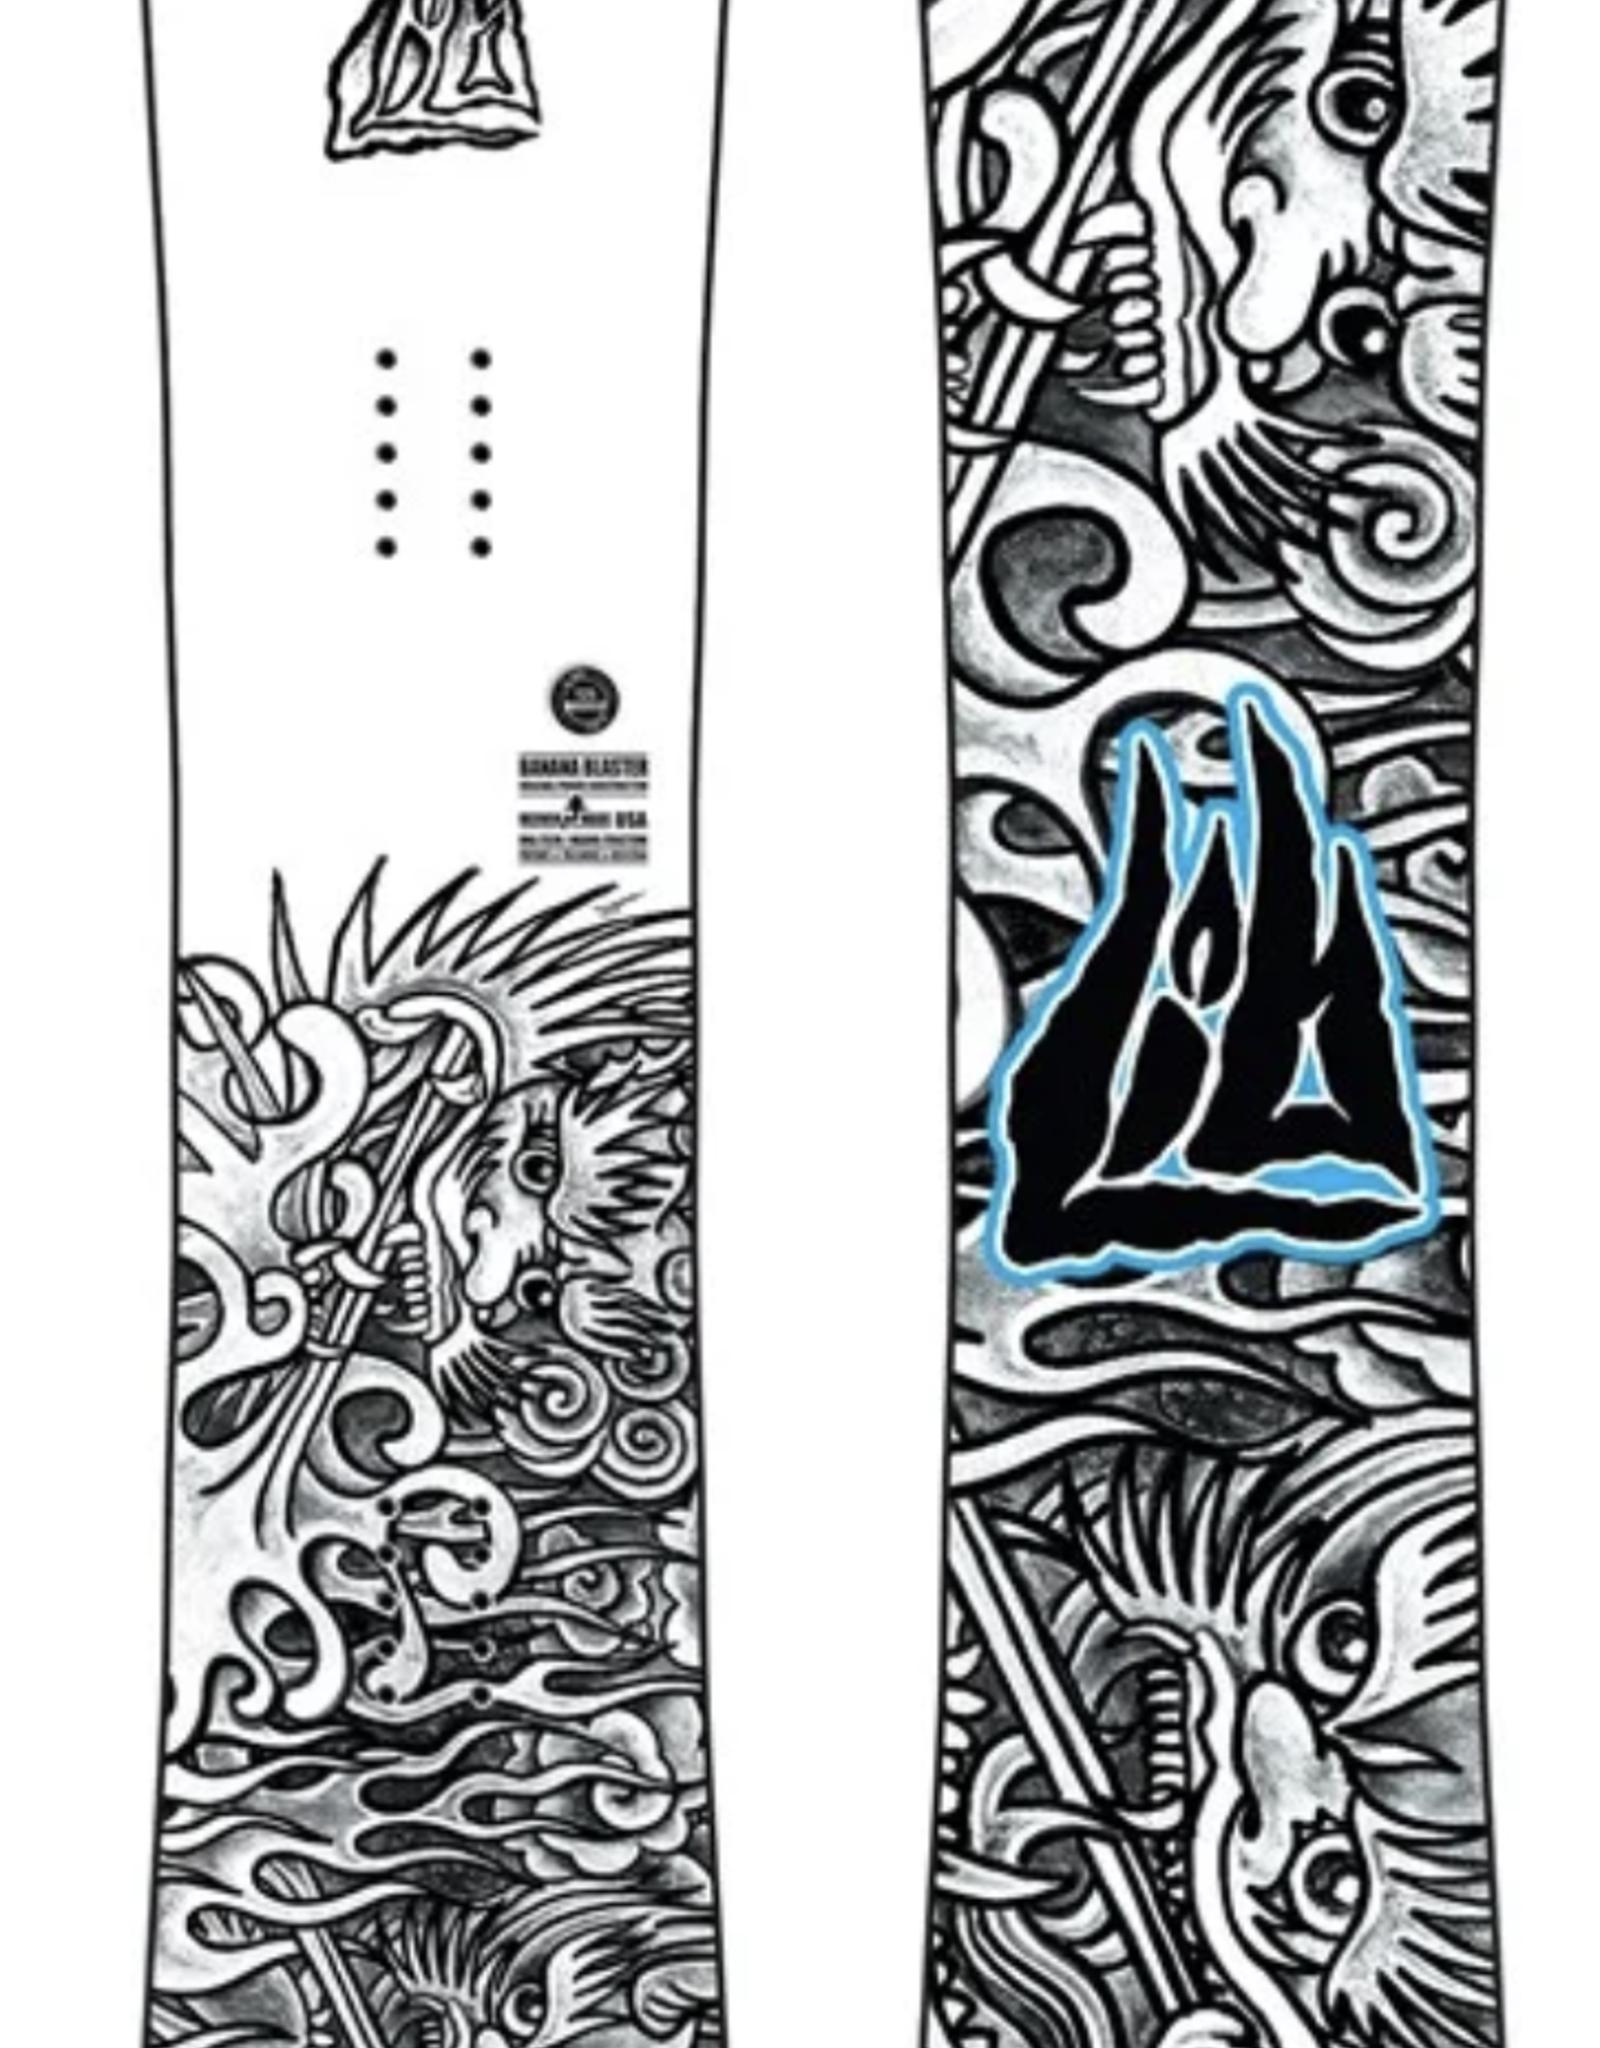 LIB TECH Lib Tech Youth Banana Blaster Snowboard 2021